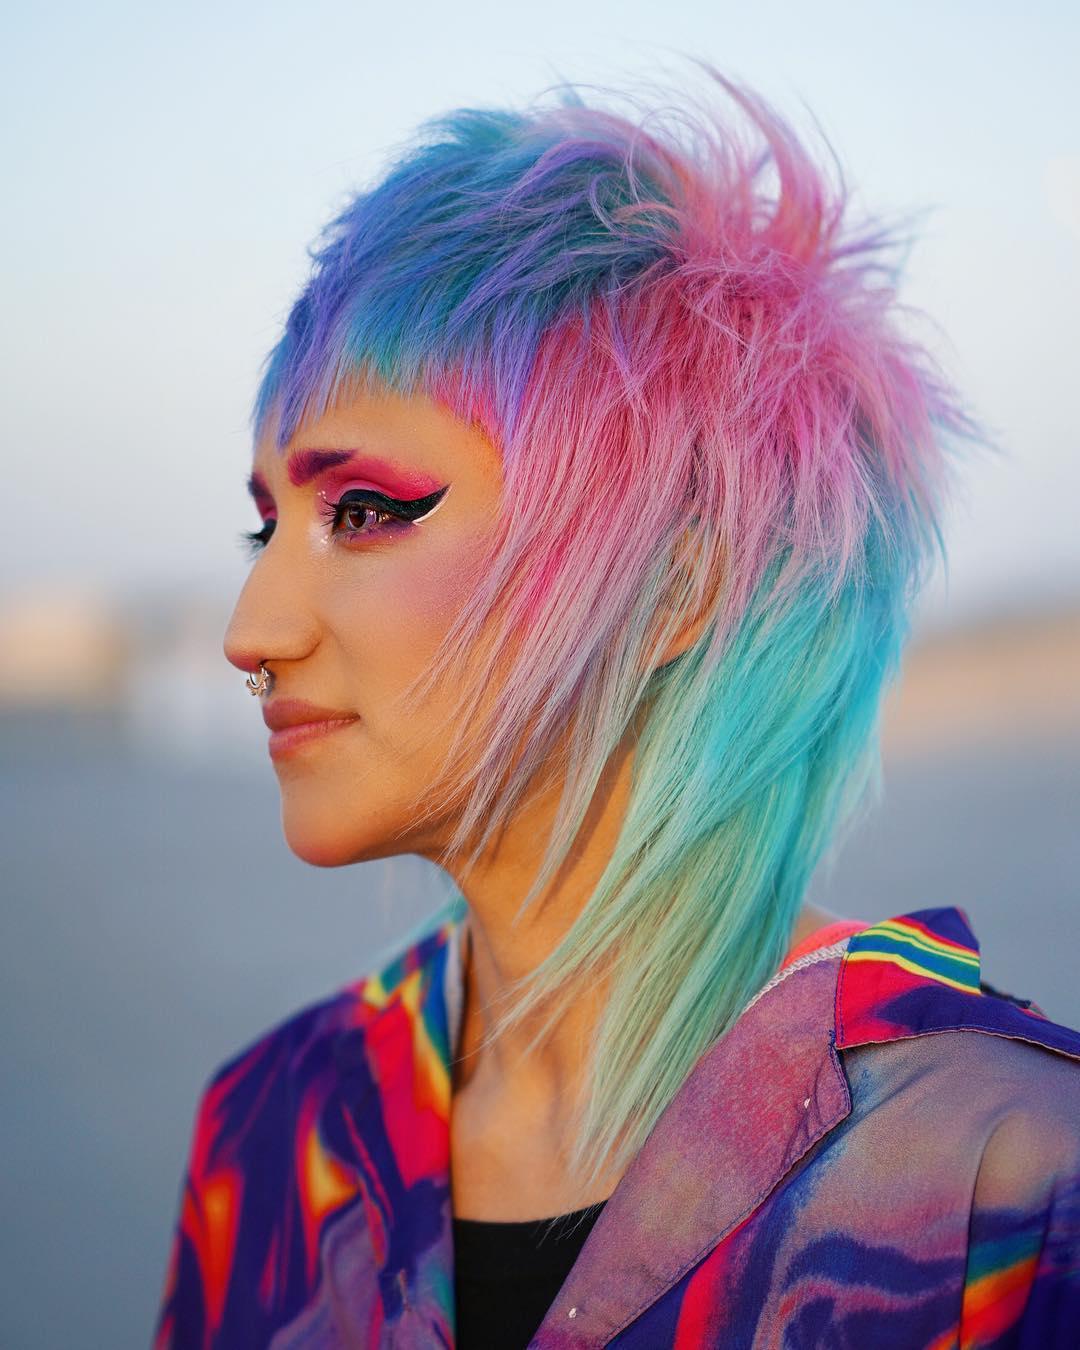 прически на средние волосы с челкой 2020 фото 7